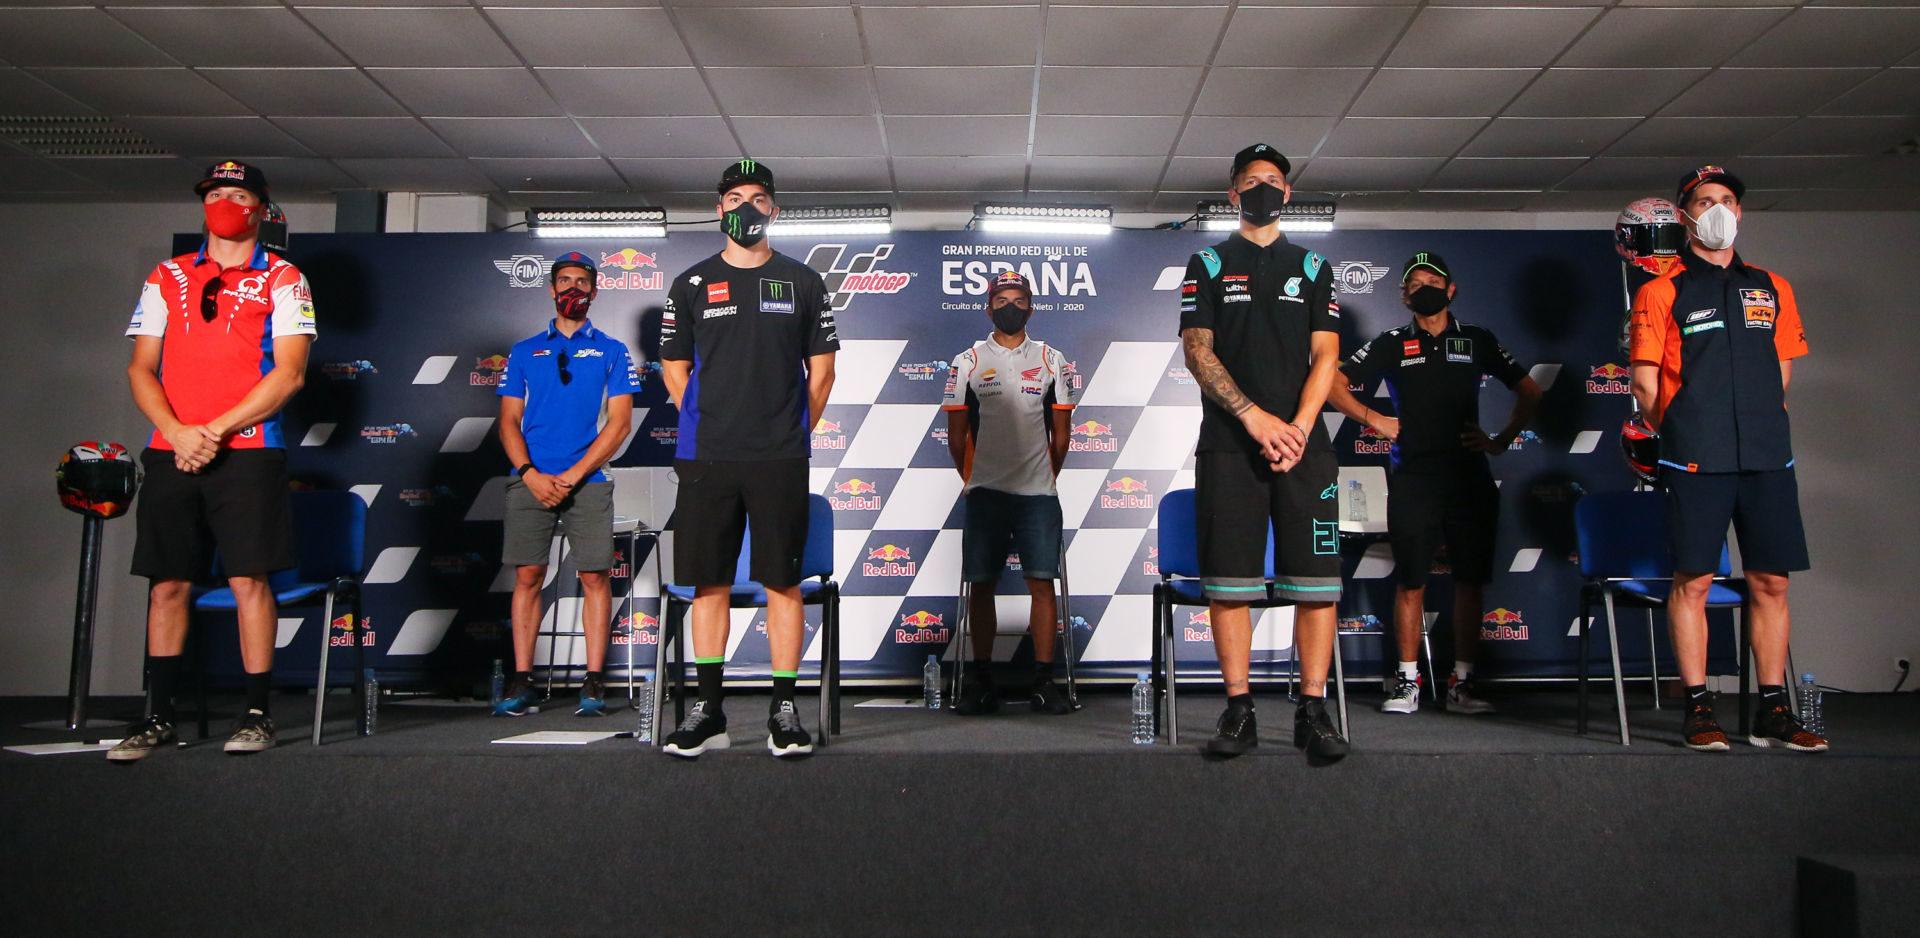 The socially distant MotoGP pre-event press conference at Jerez with (from left) Jack Miller, Alex Rins, Maverick Vinales, Marc Marquez, Fabio Quartararo, Valentino Rossi, and Pol Espargaro. Photo courtesy Dorna.